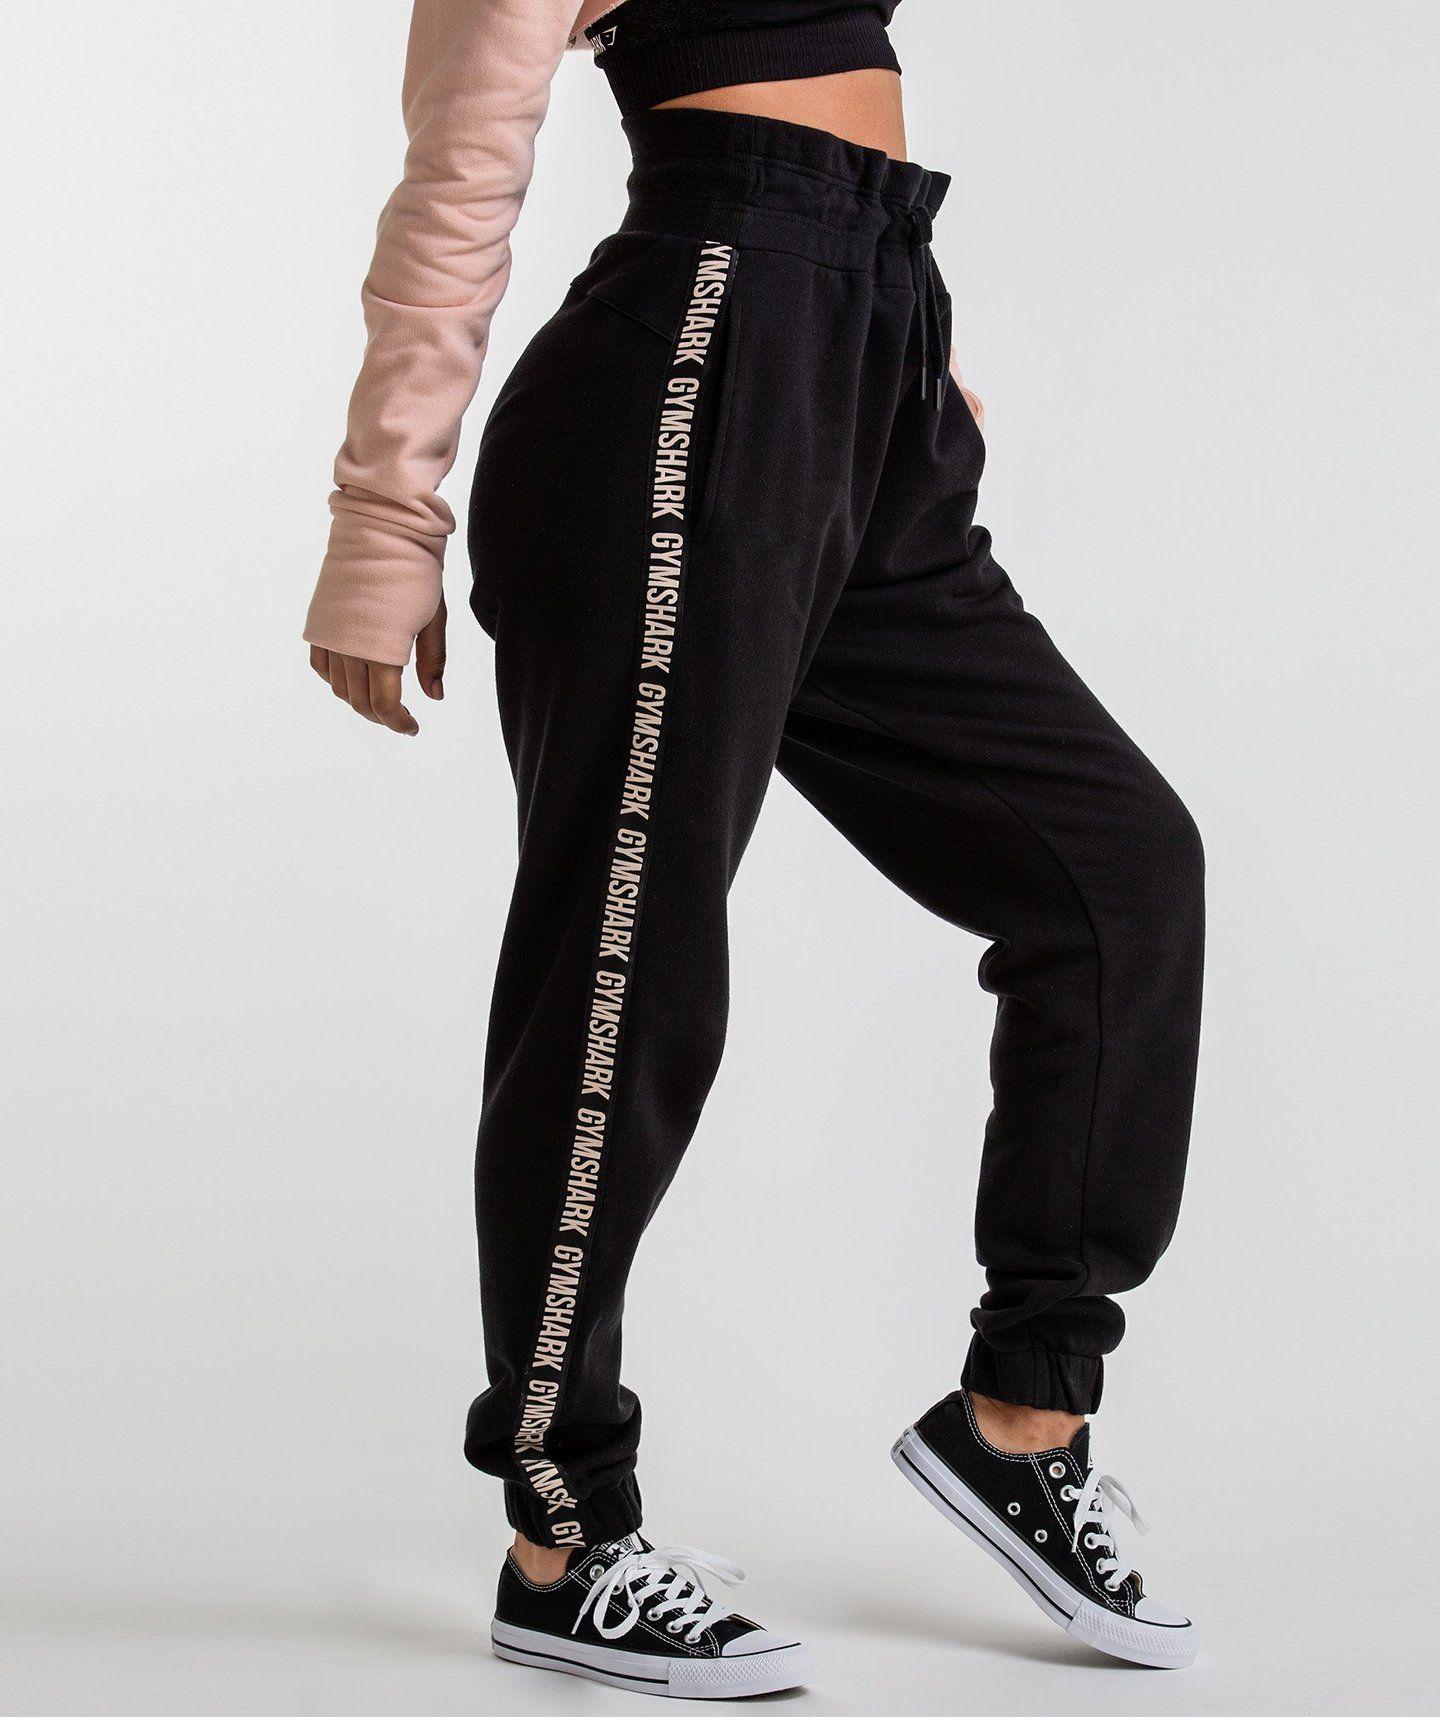 Womens Cropped Joggers Plain Crop Cotton Sweat Pants Bottoms Cuff Gym Dance New